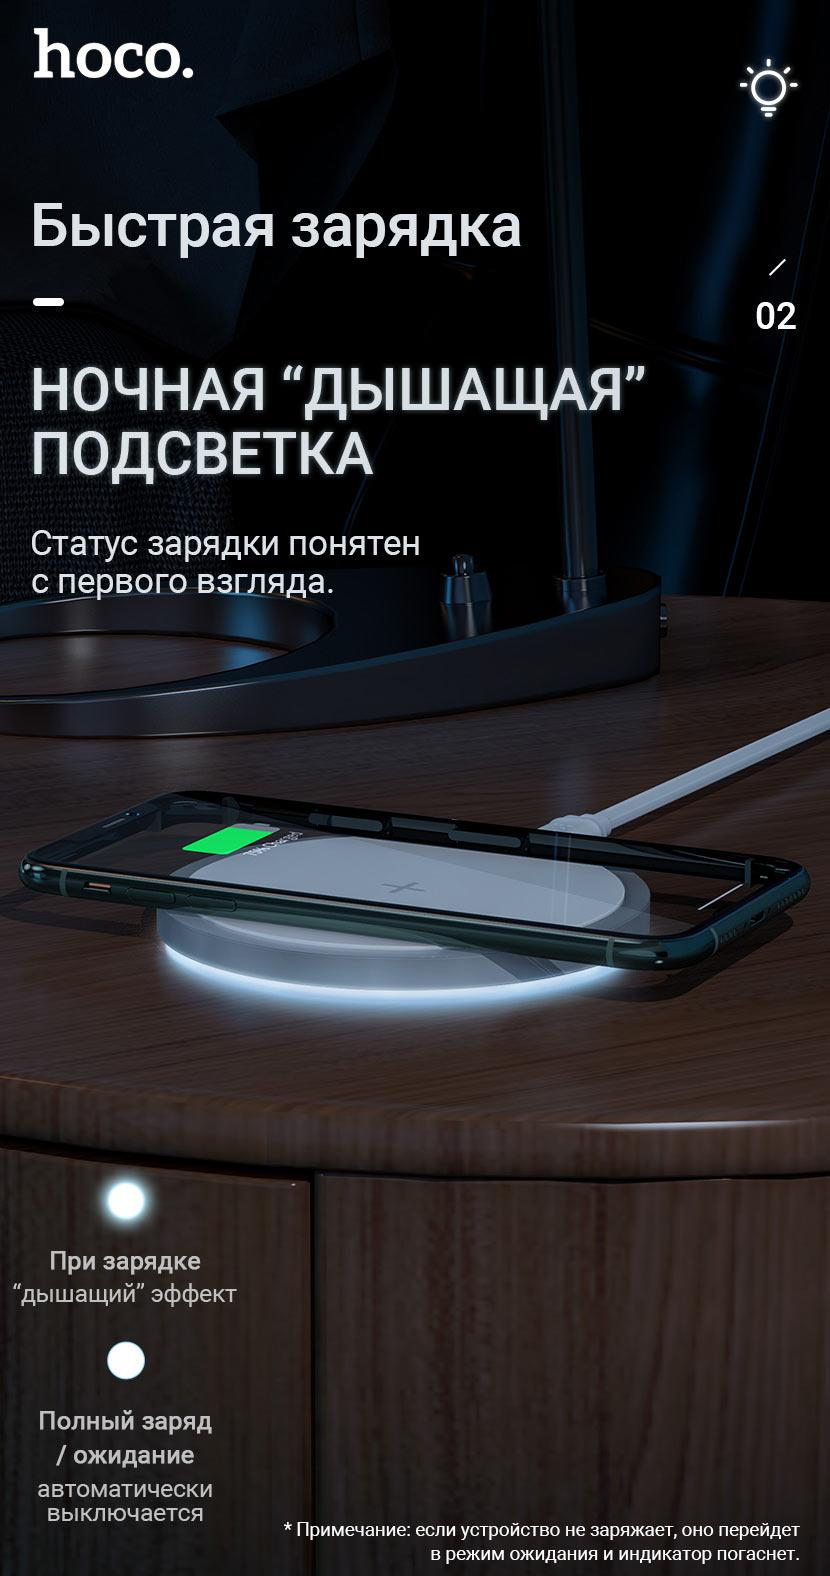 hoco news cw26 powerful 15w wireless fast charger light ru